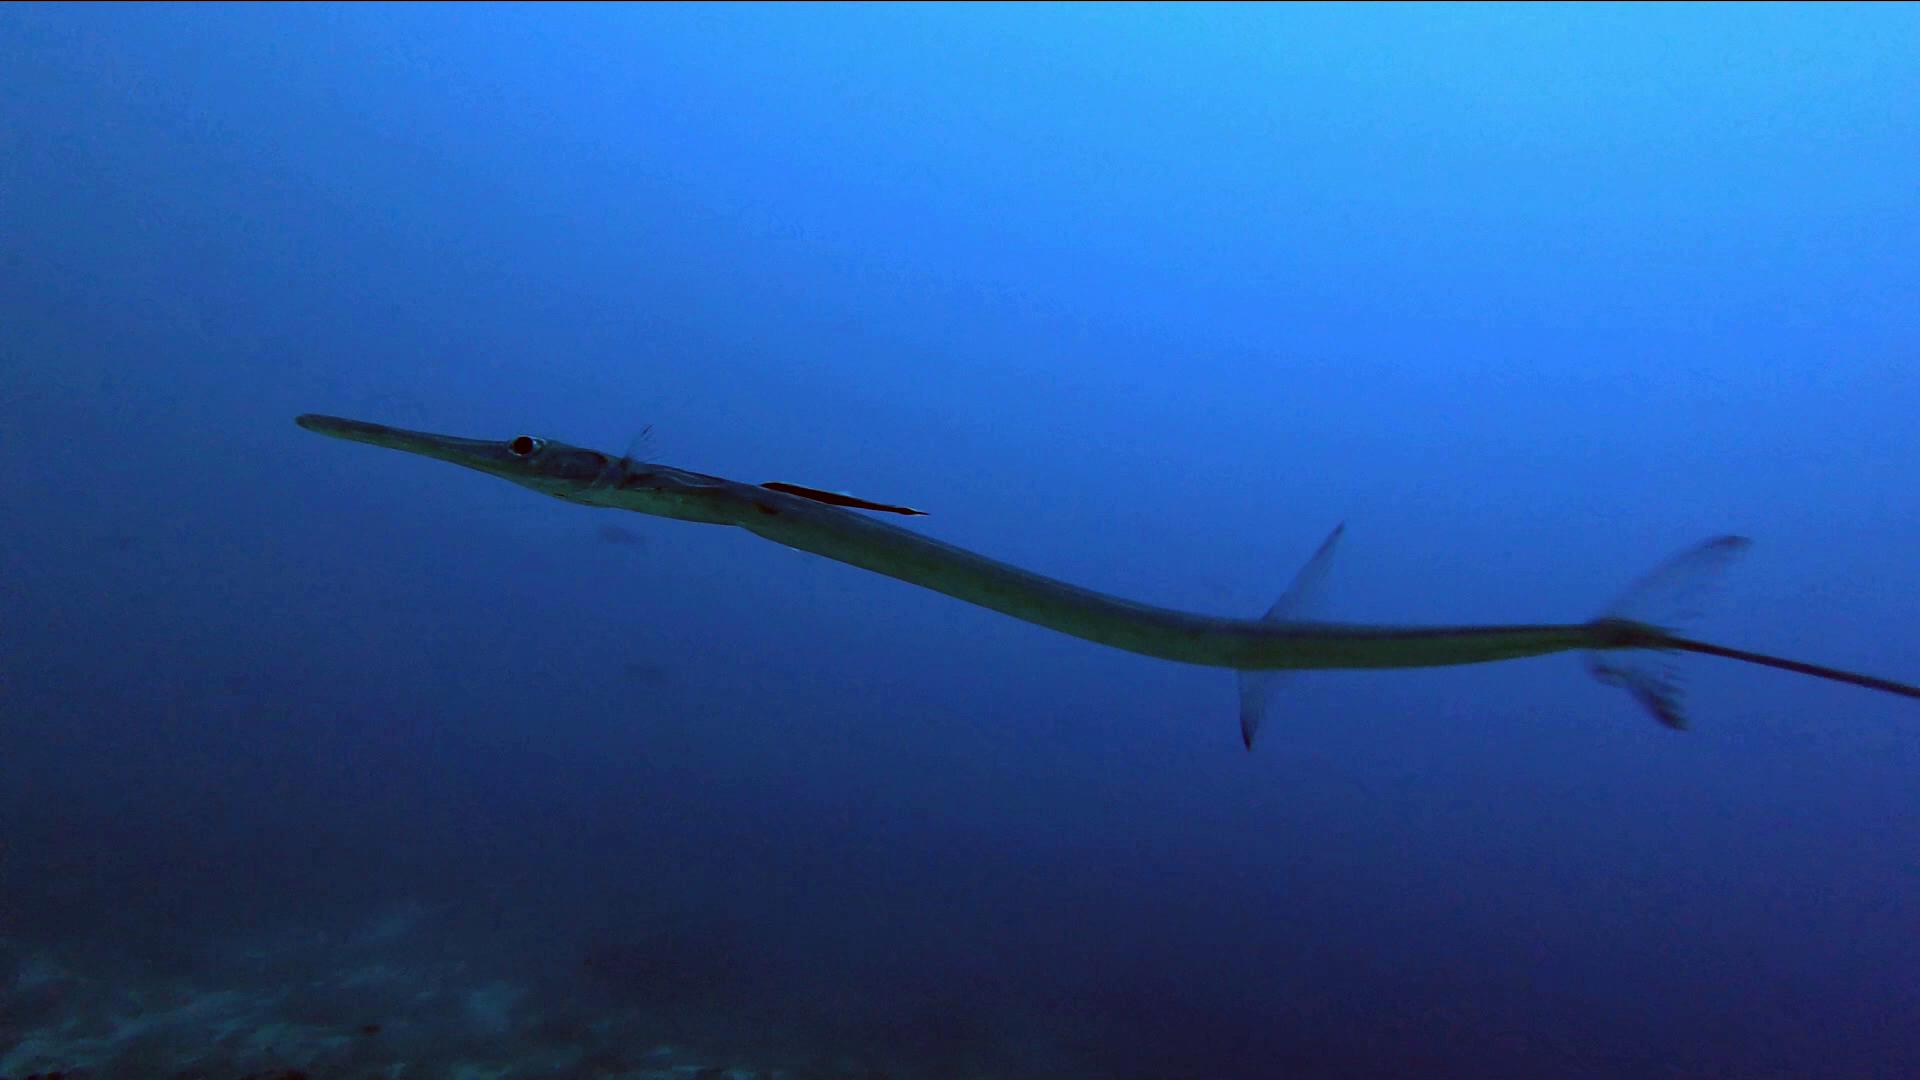 The bluespotted Cornetfish - Fistularia commersonii - Il Pesce Flauto - intotheblue.it